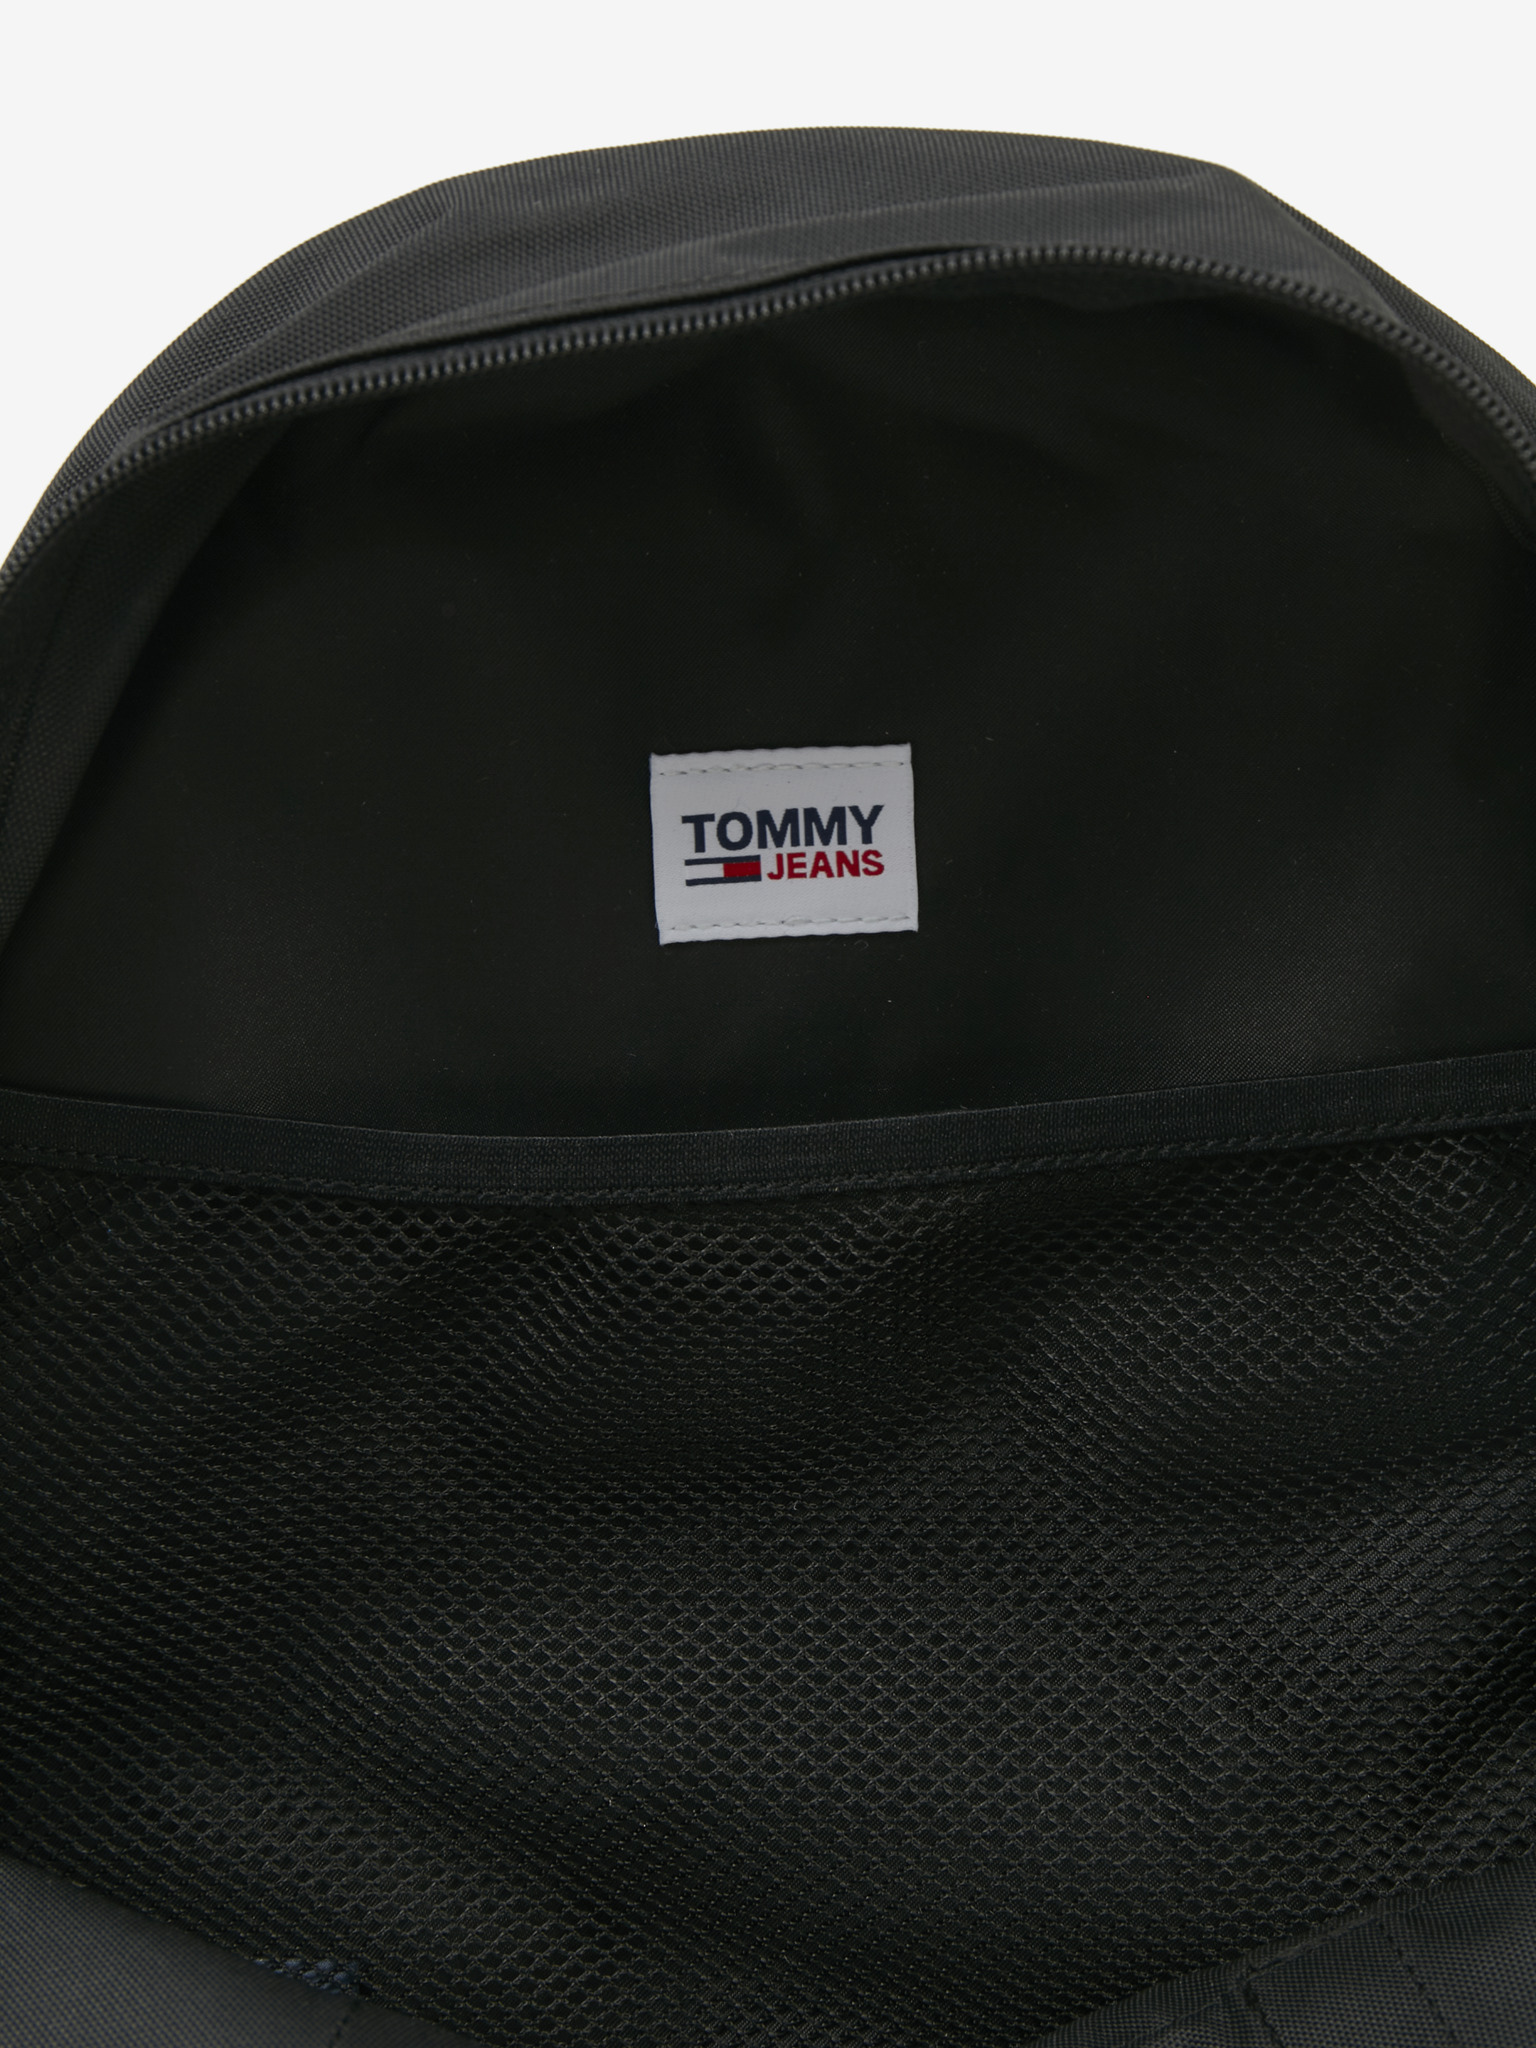 Tommy Jeans Zaino donna nero Batoh